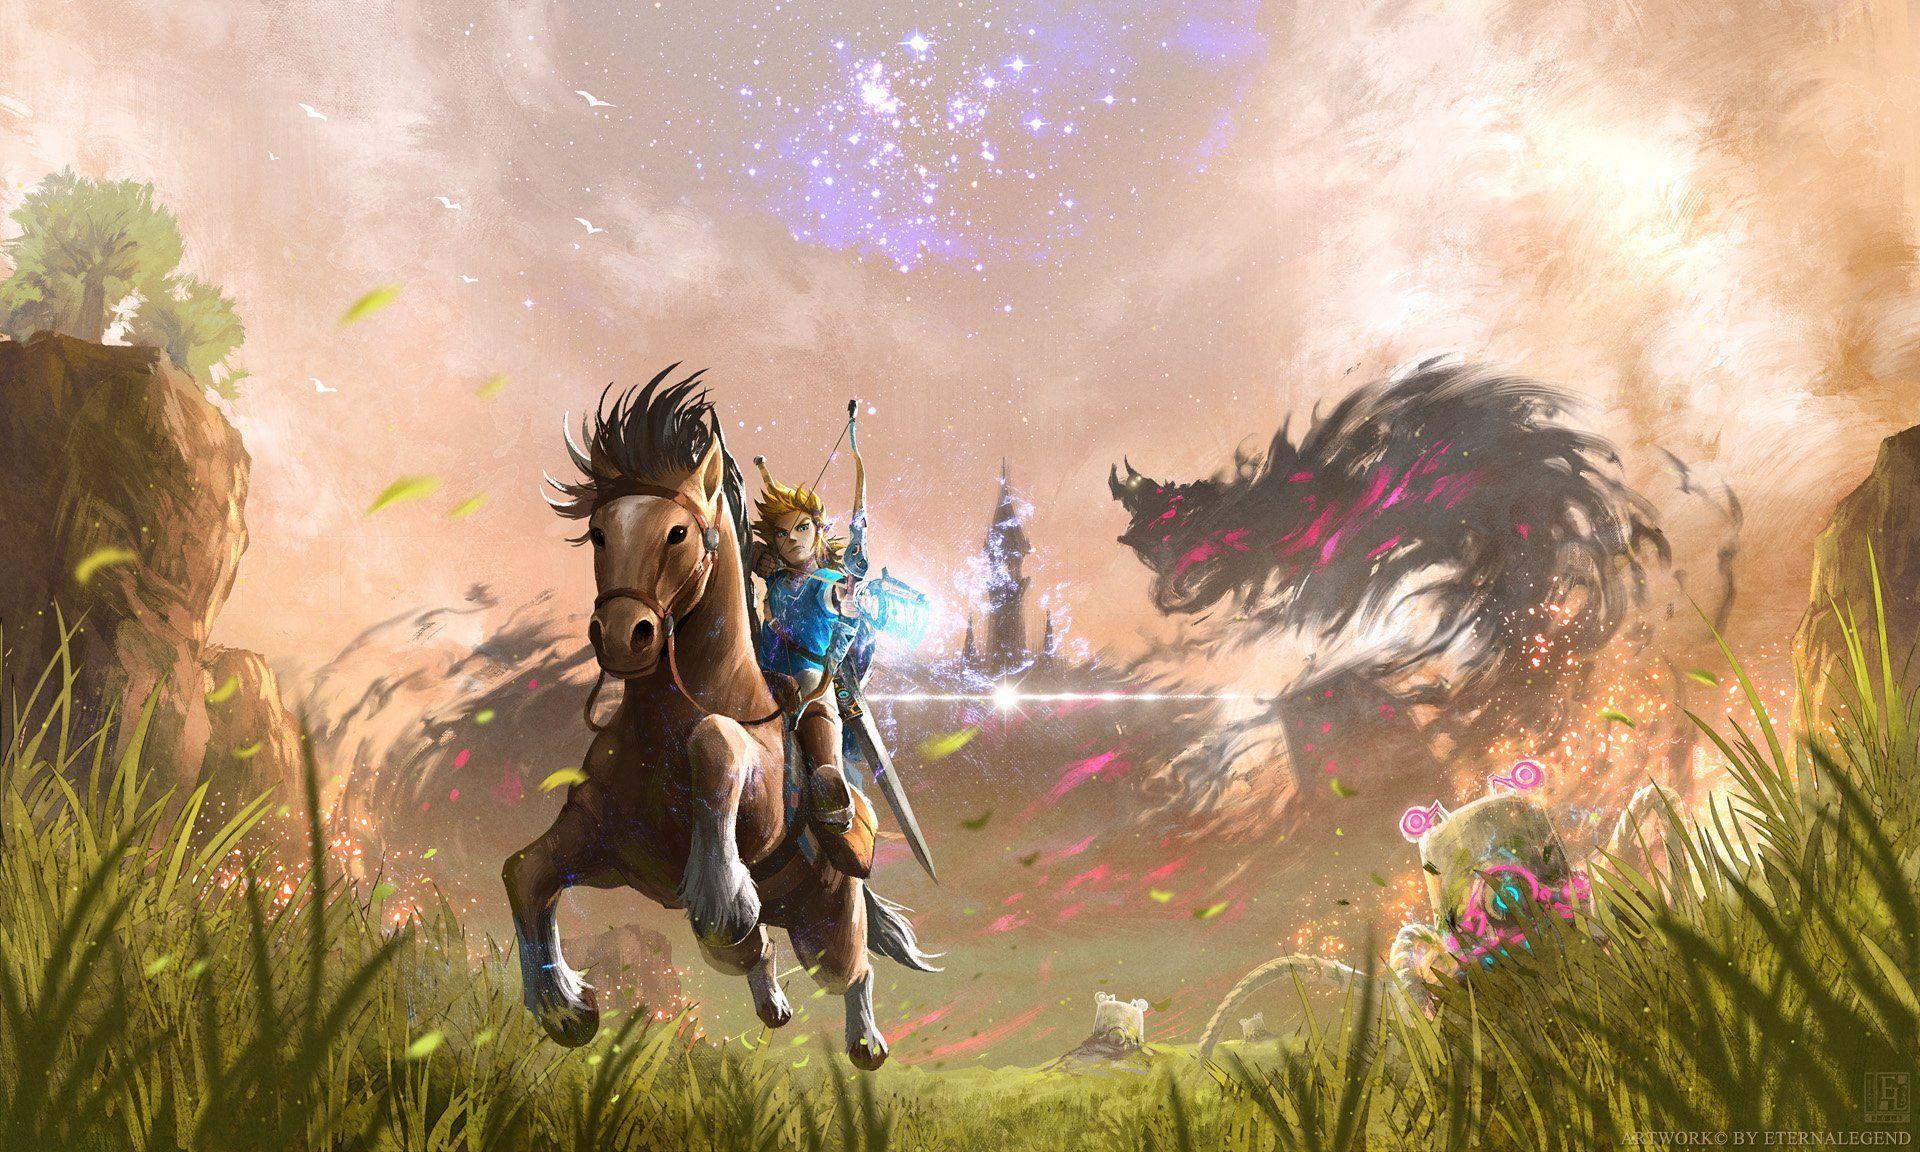 Zelda Images